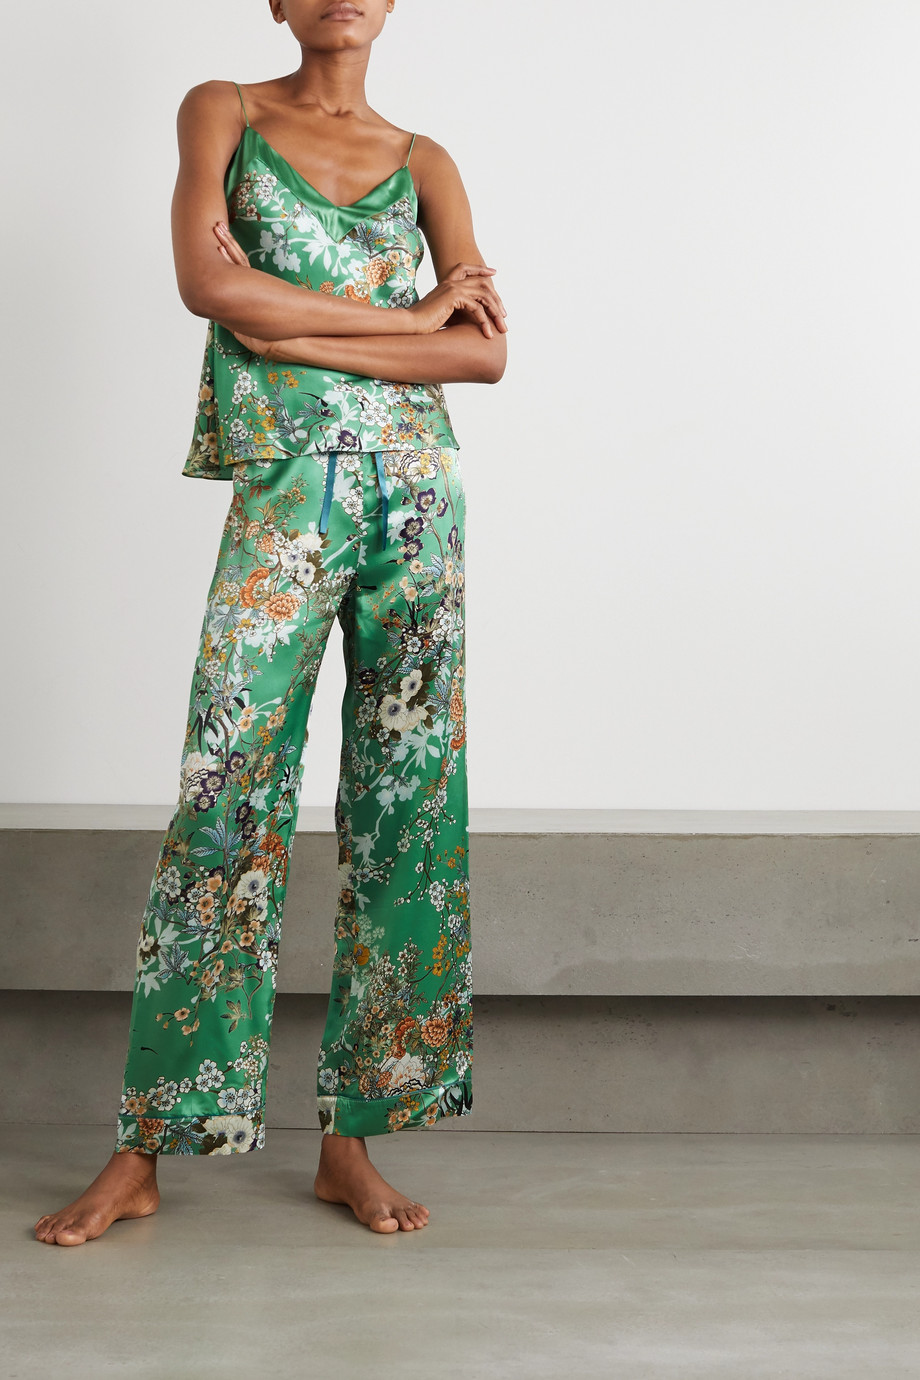 MENG 花卉印花丝缎睡裤